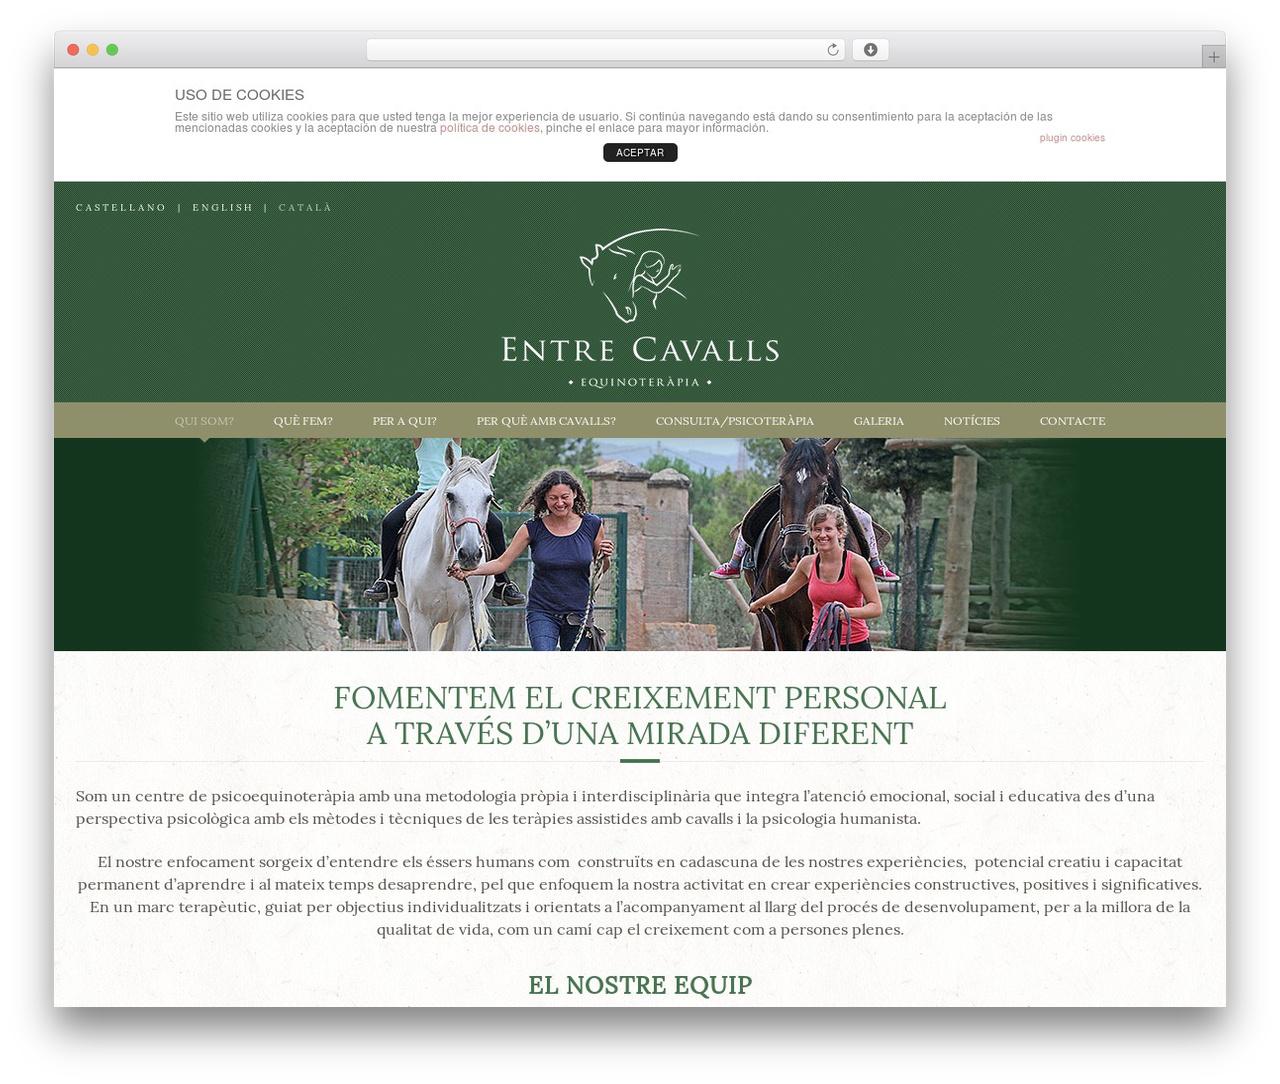 Equestrian WordPress theme - entrecavalls.com/?password-protected=login&redirect_to=entrecavalls.com